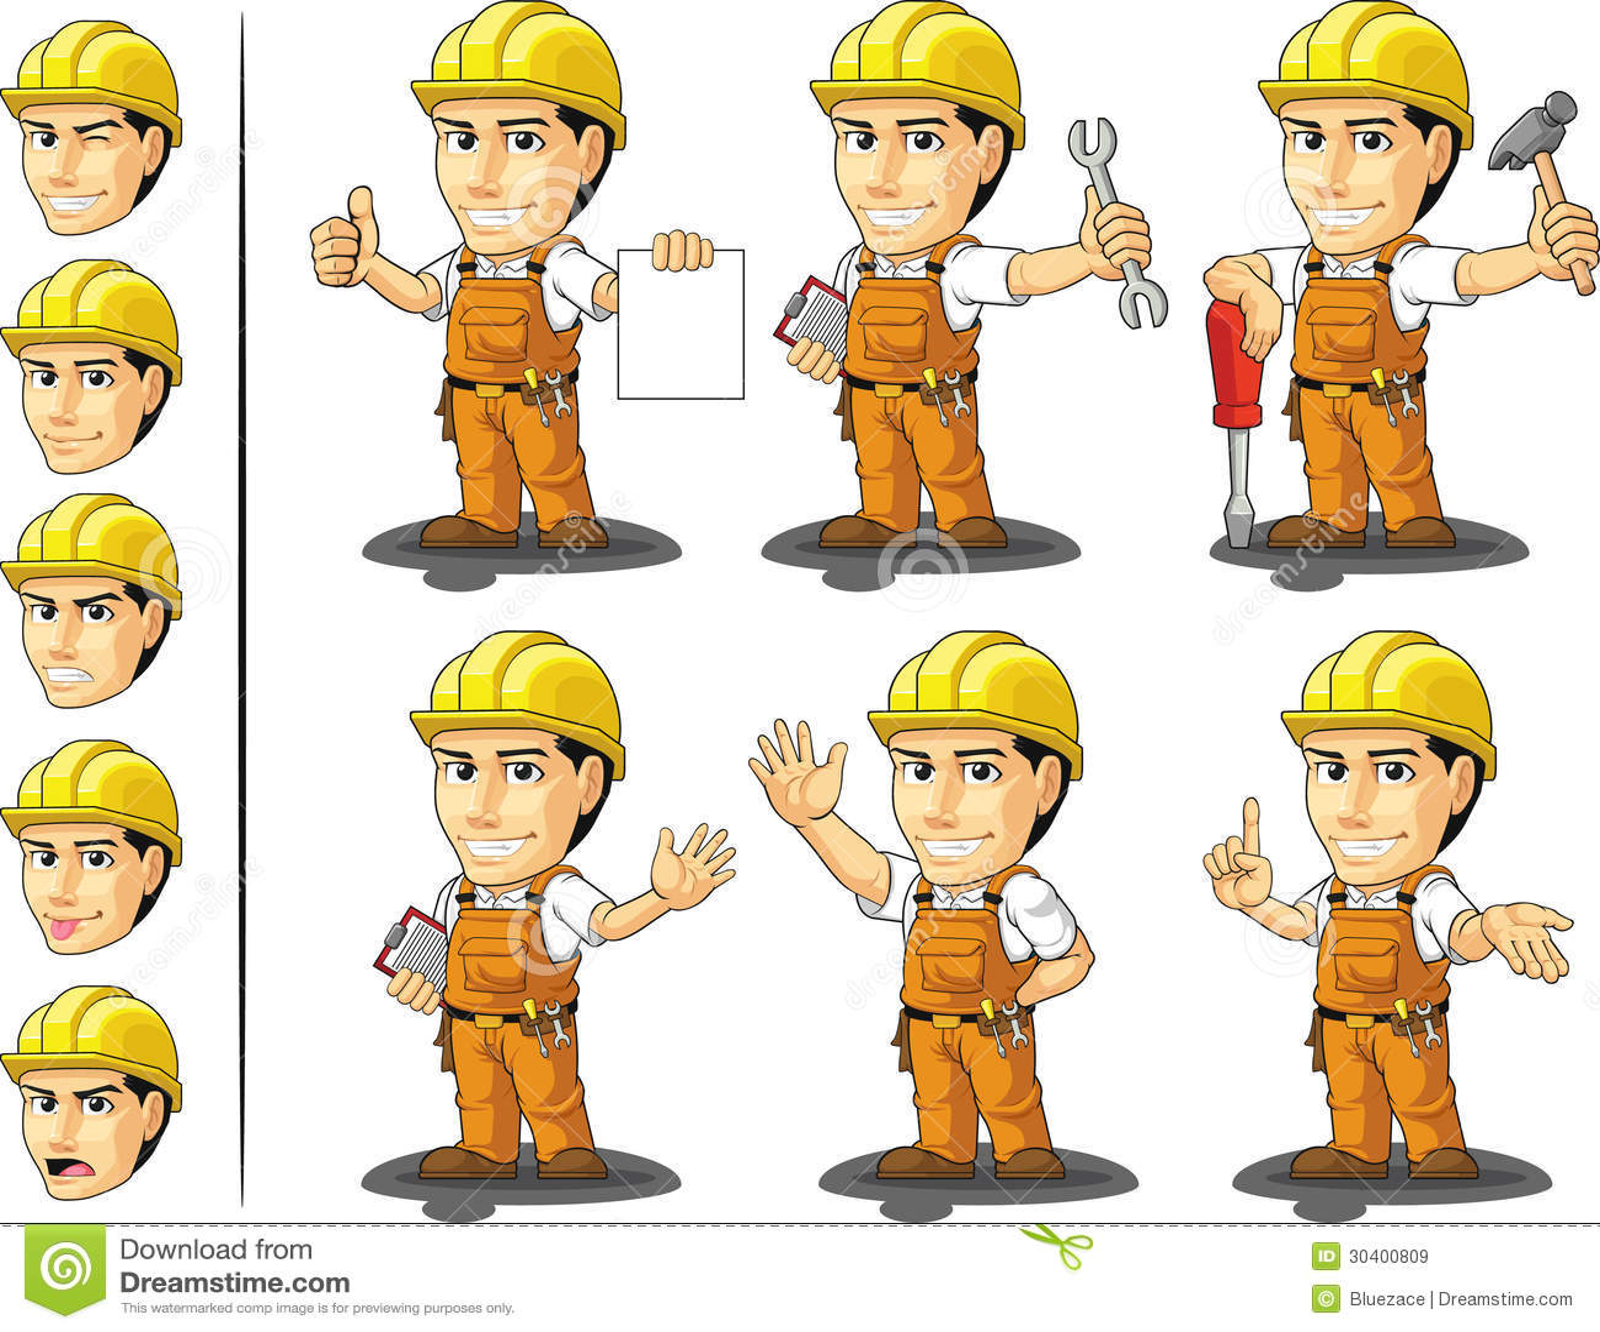 Bauarbeiter clipart schwarz weiß  Karikatur Bauarbeiter Stock Illustrationen, Vektors, & Klipart ...